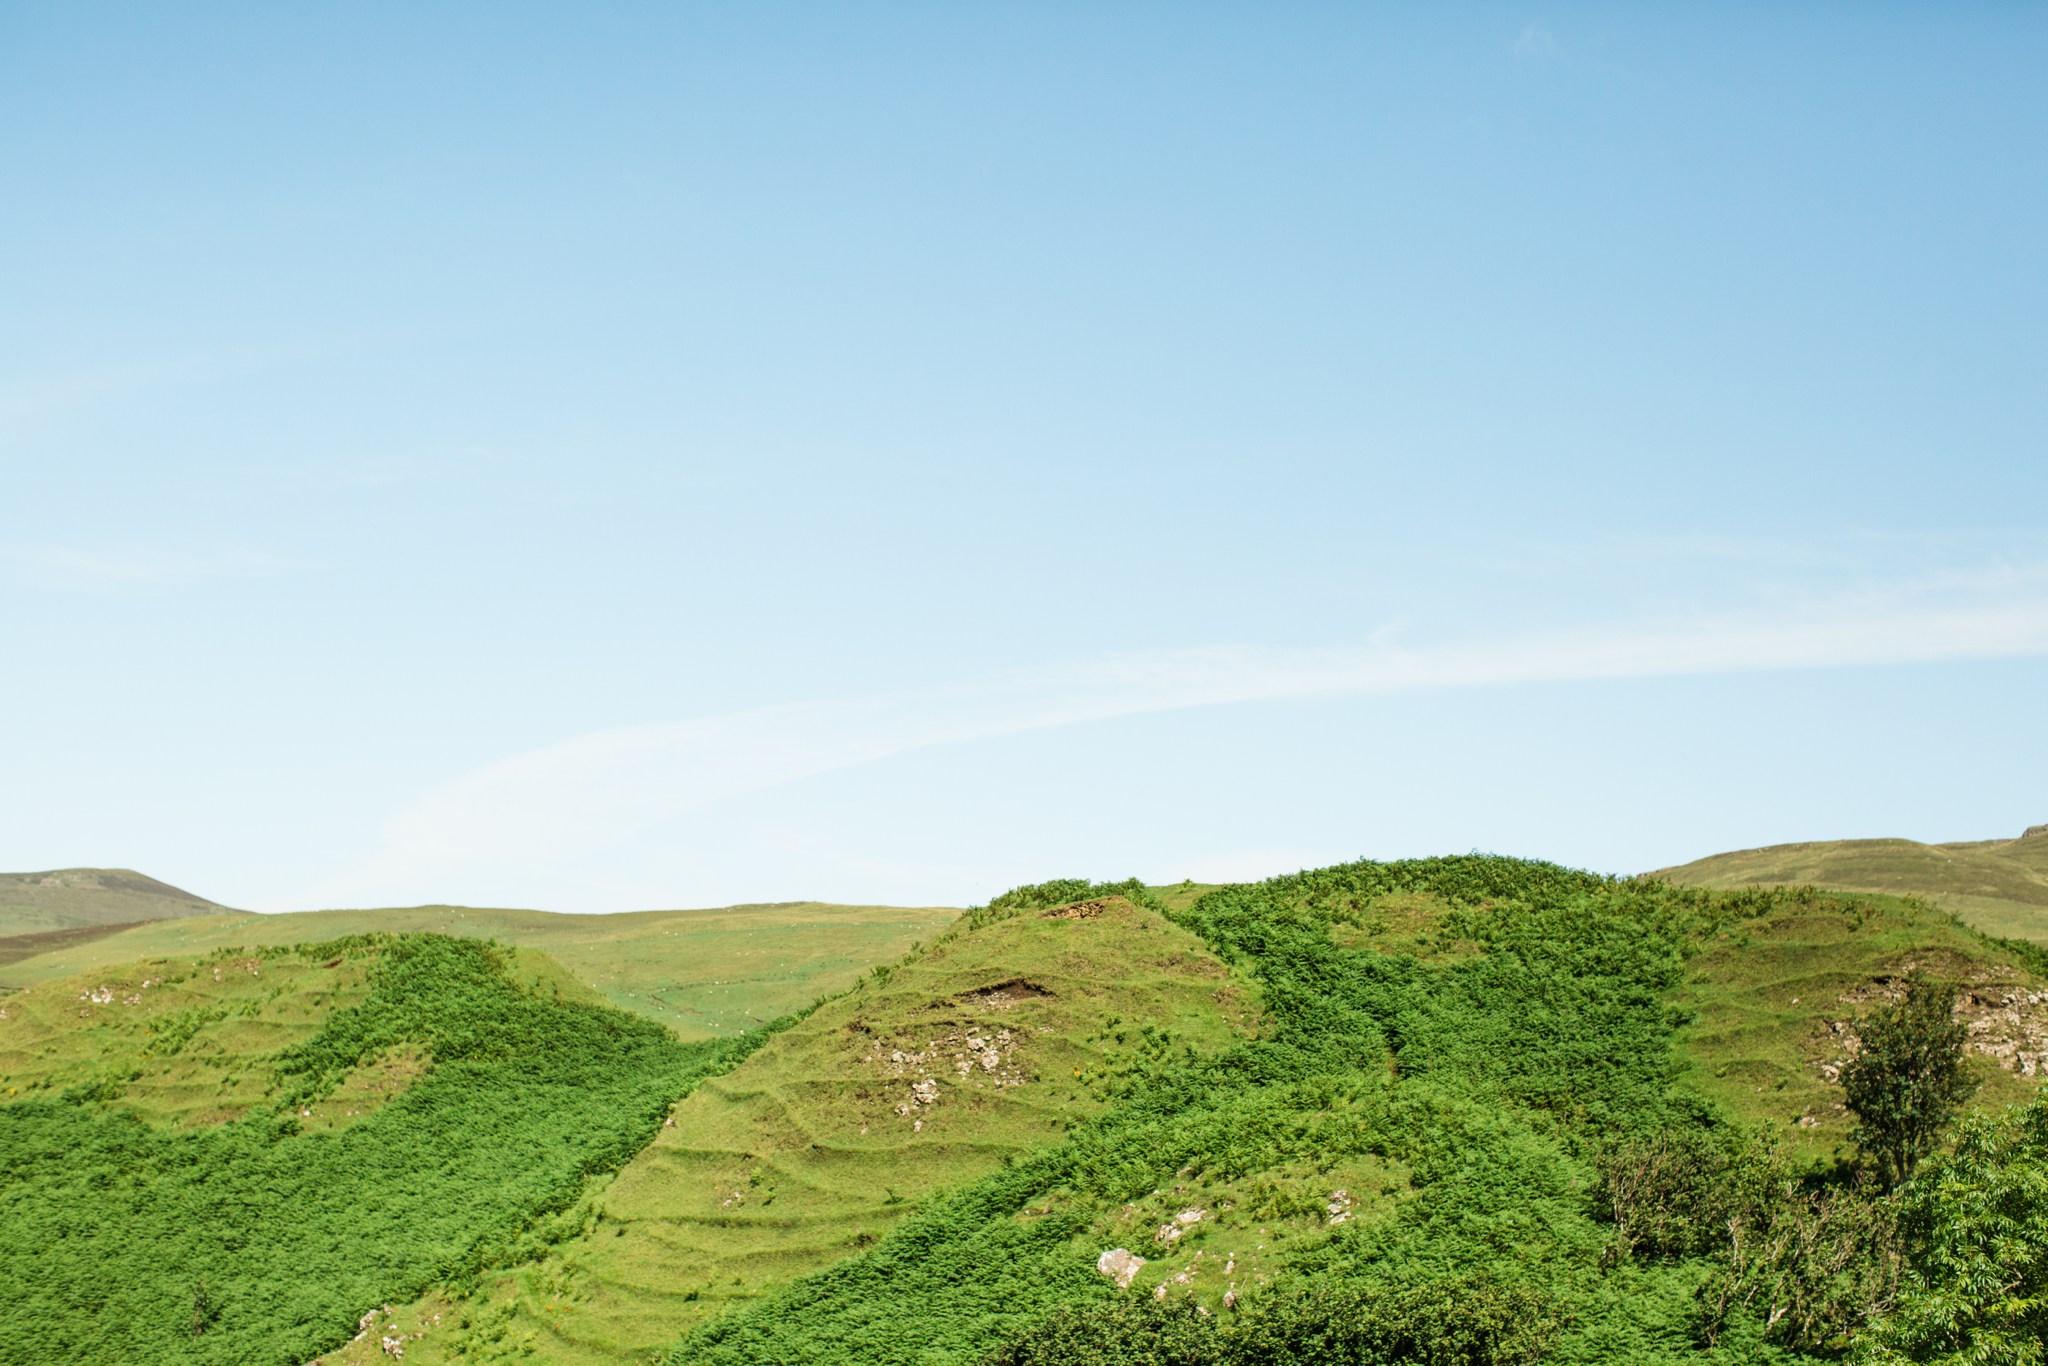 scotland_highlands_deborah_zoe_0070.JPG